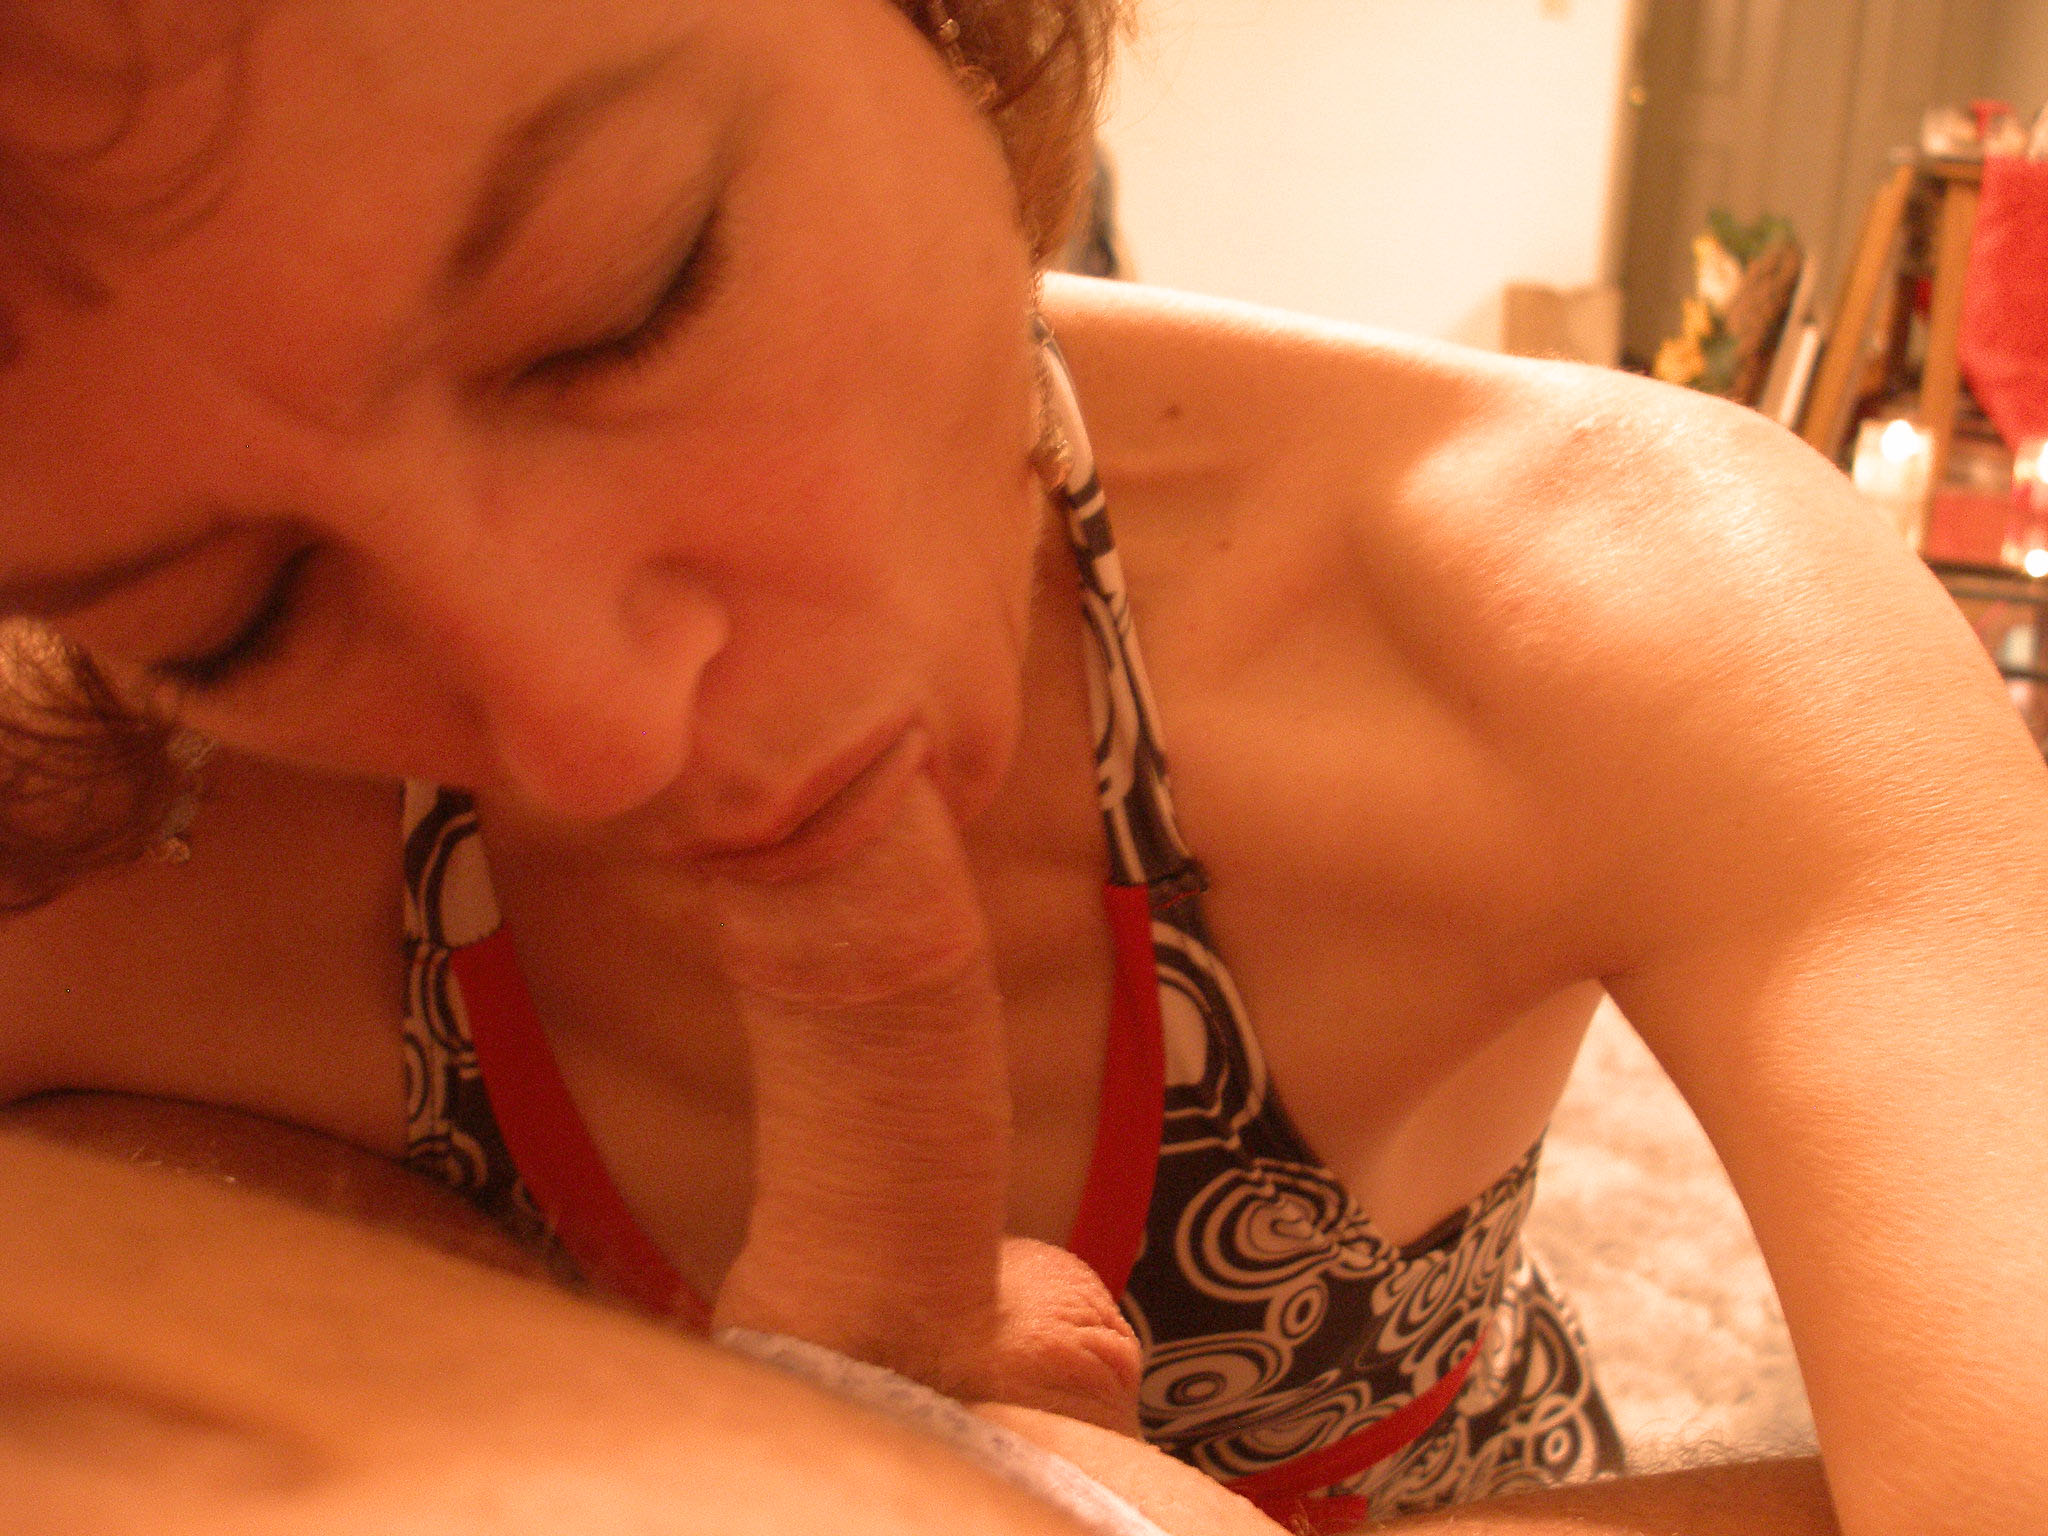 Homemade Latina Wife Anal